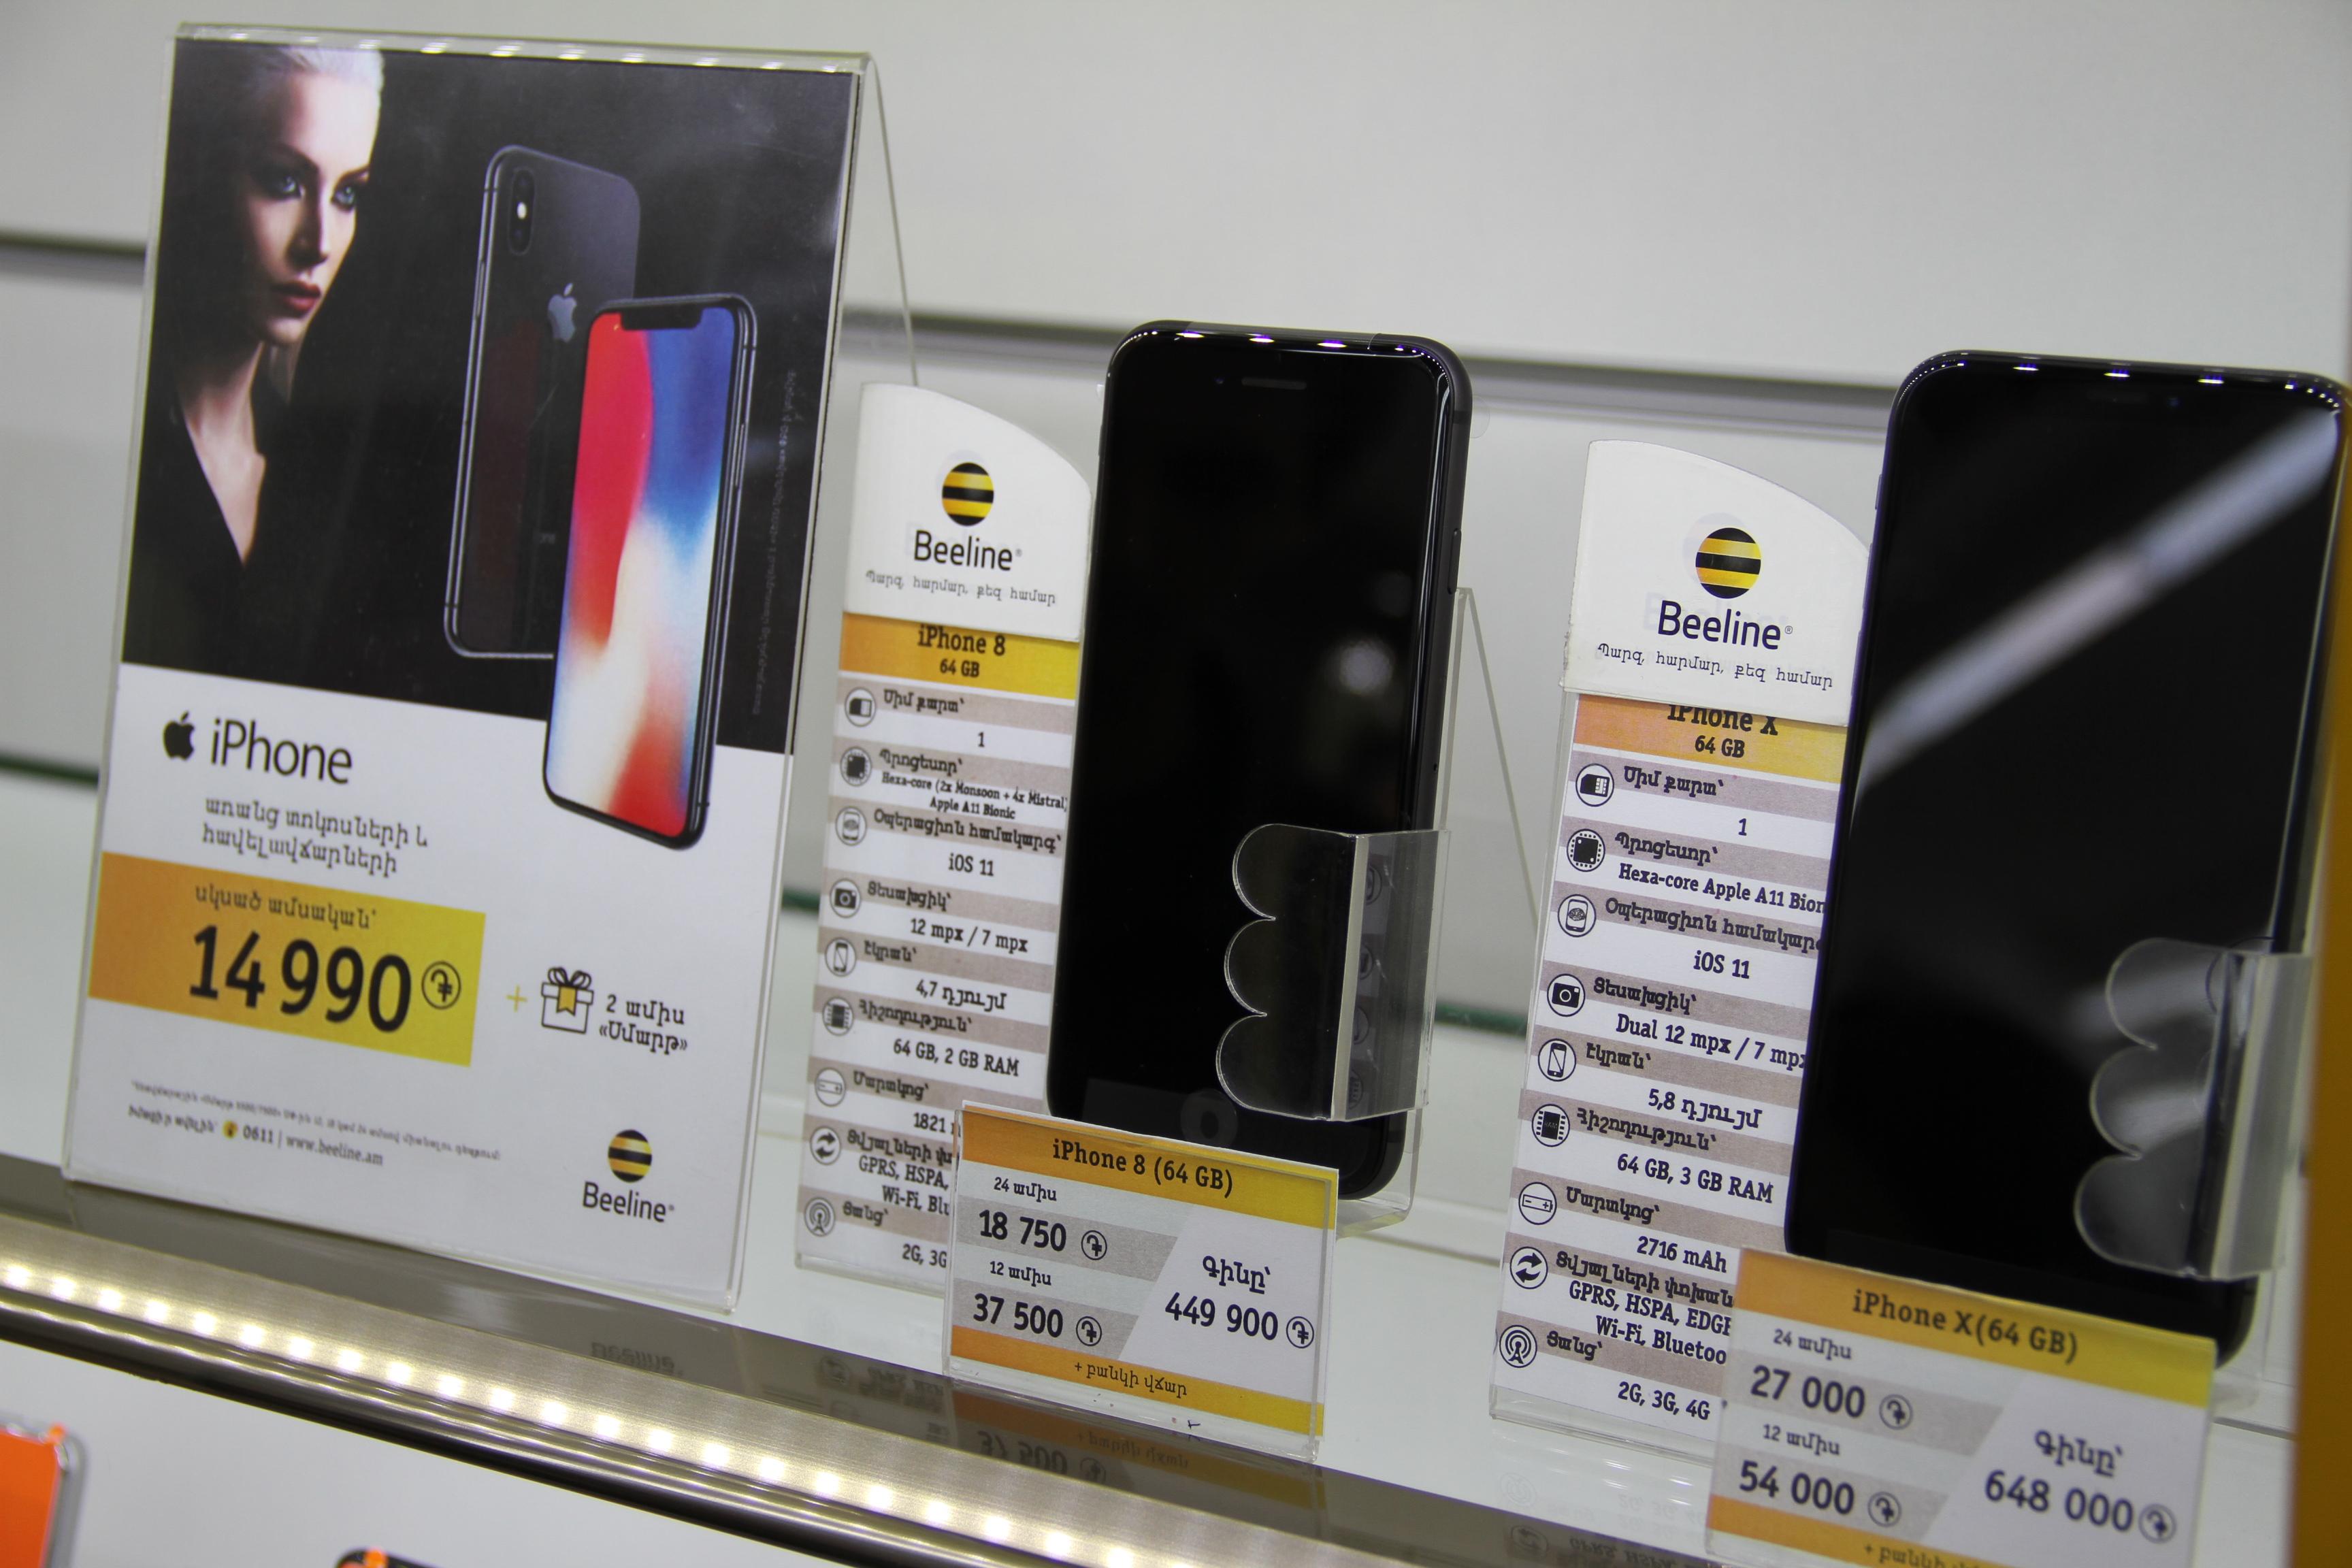 Beeline предложил уникальные условия продажи iPhone